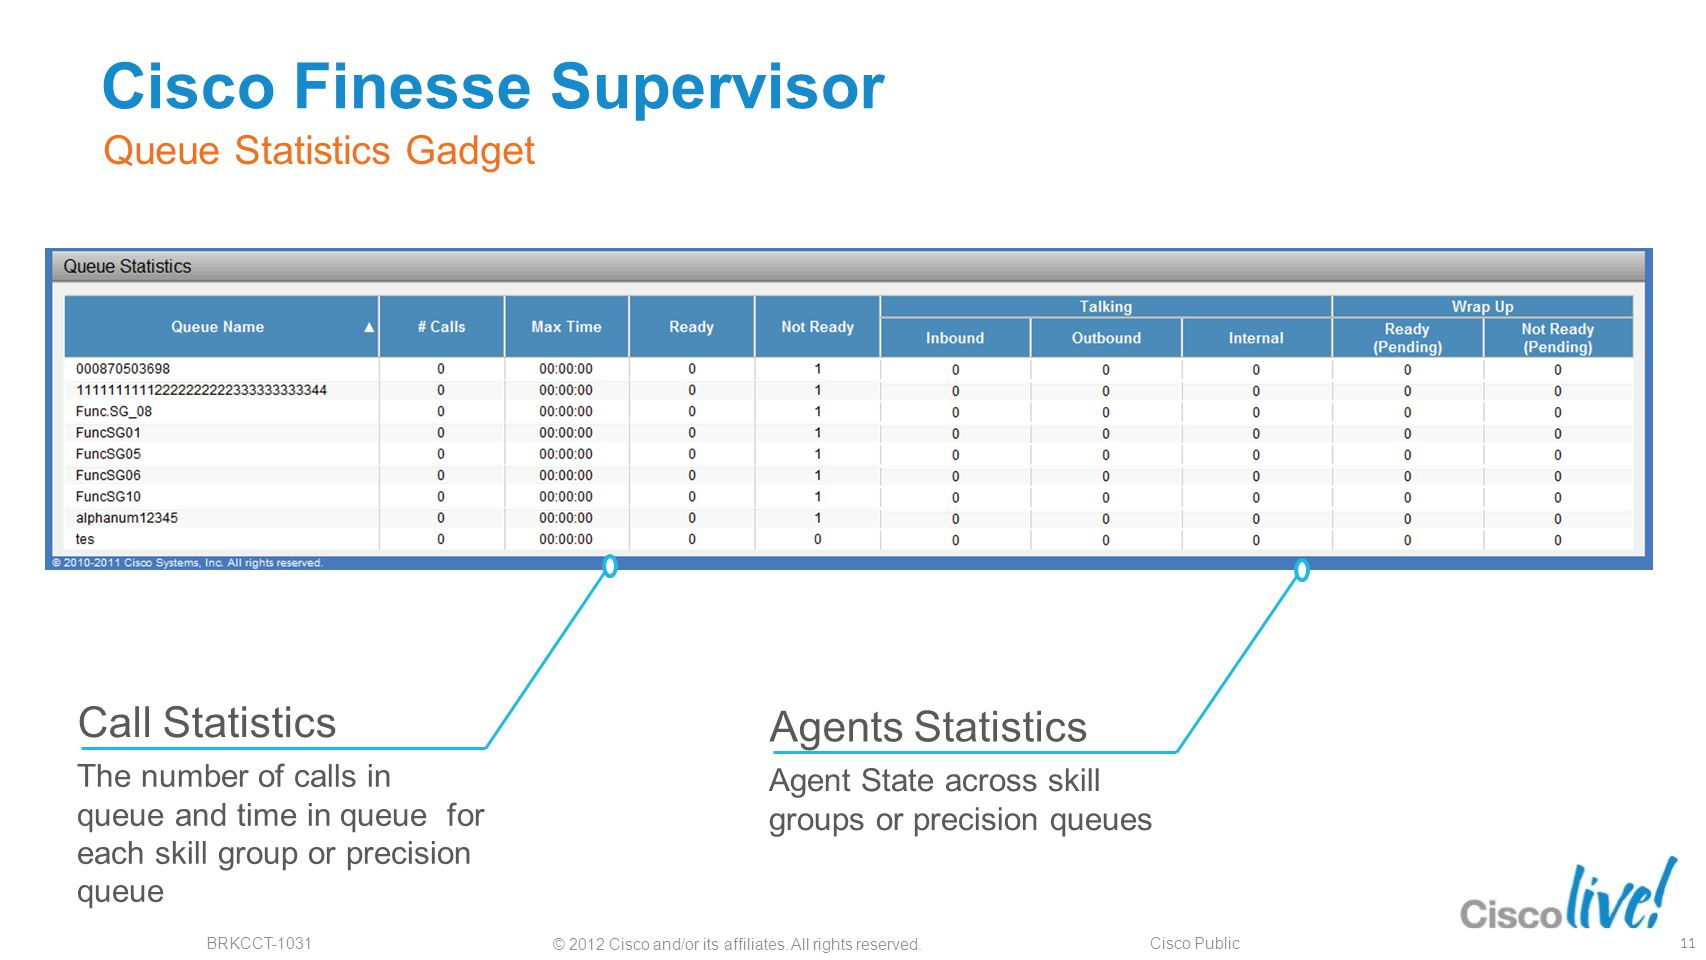 Cisco Finesse Supervisor